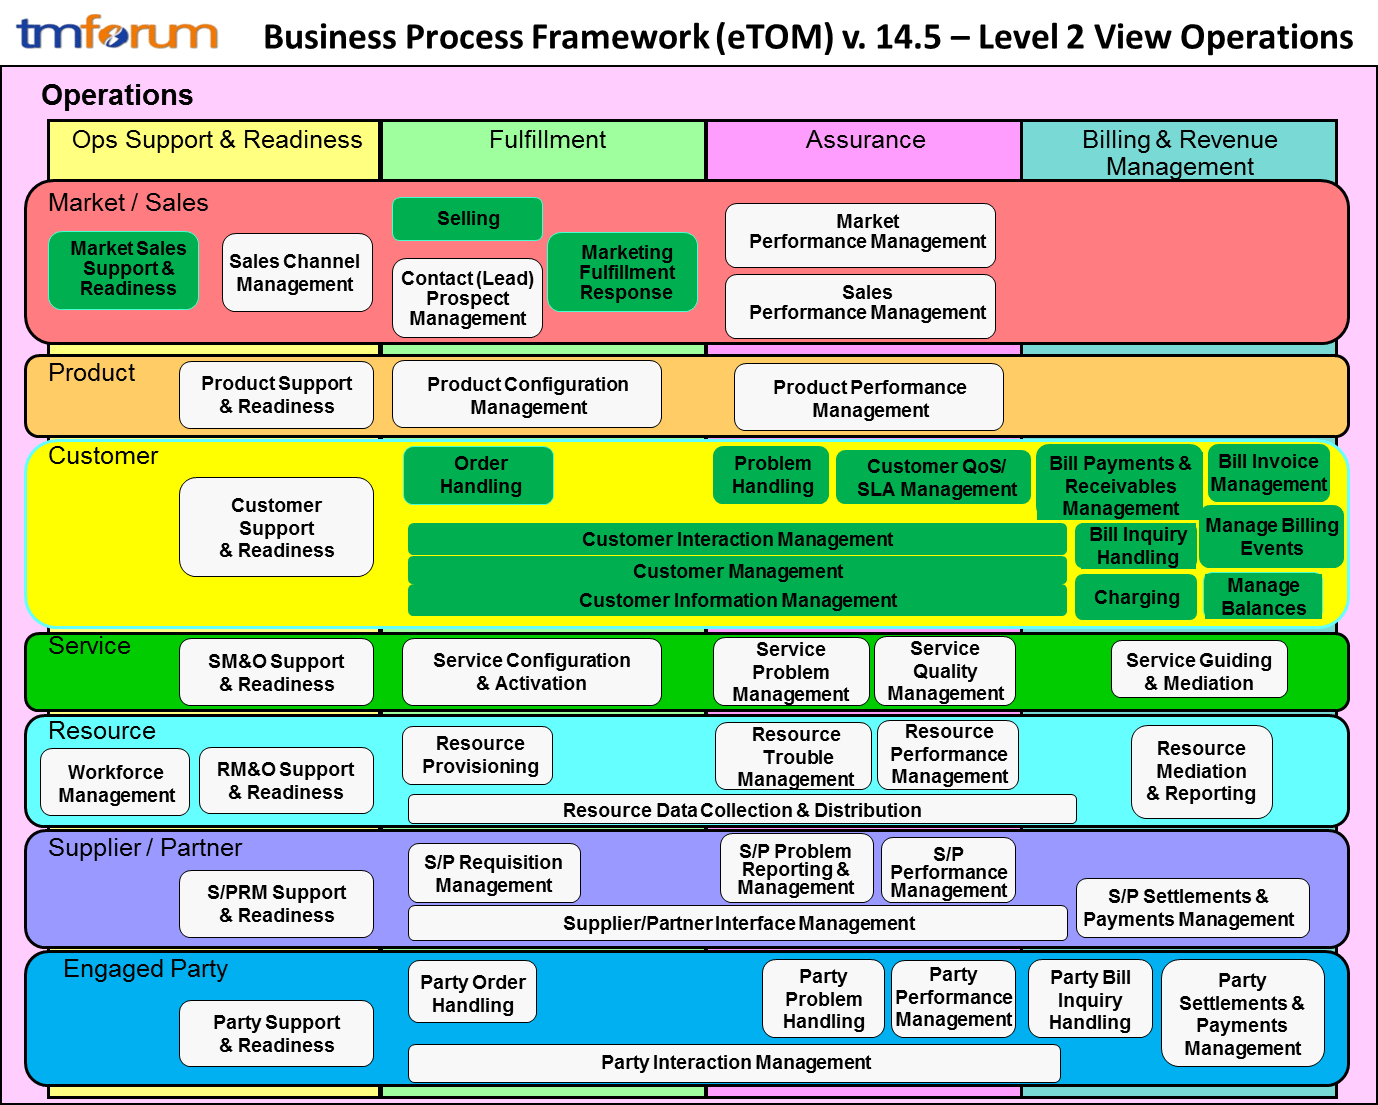 Telefnica business process blueprint design tm forum scope of assessment business process framework footprint malvernweather Image collections